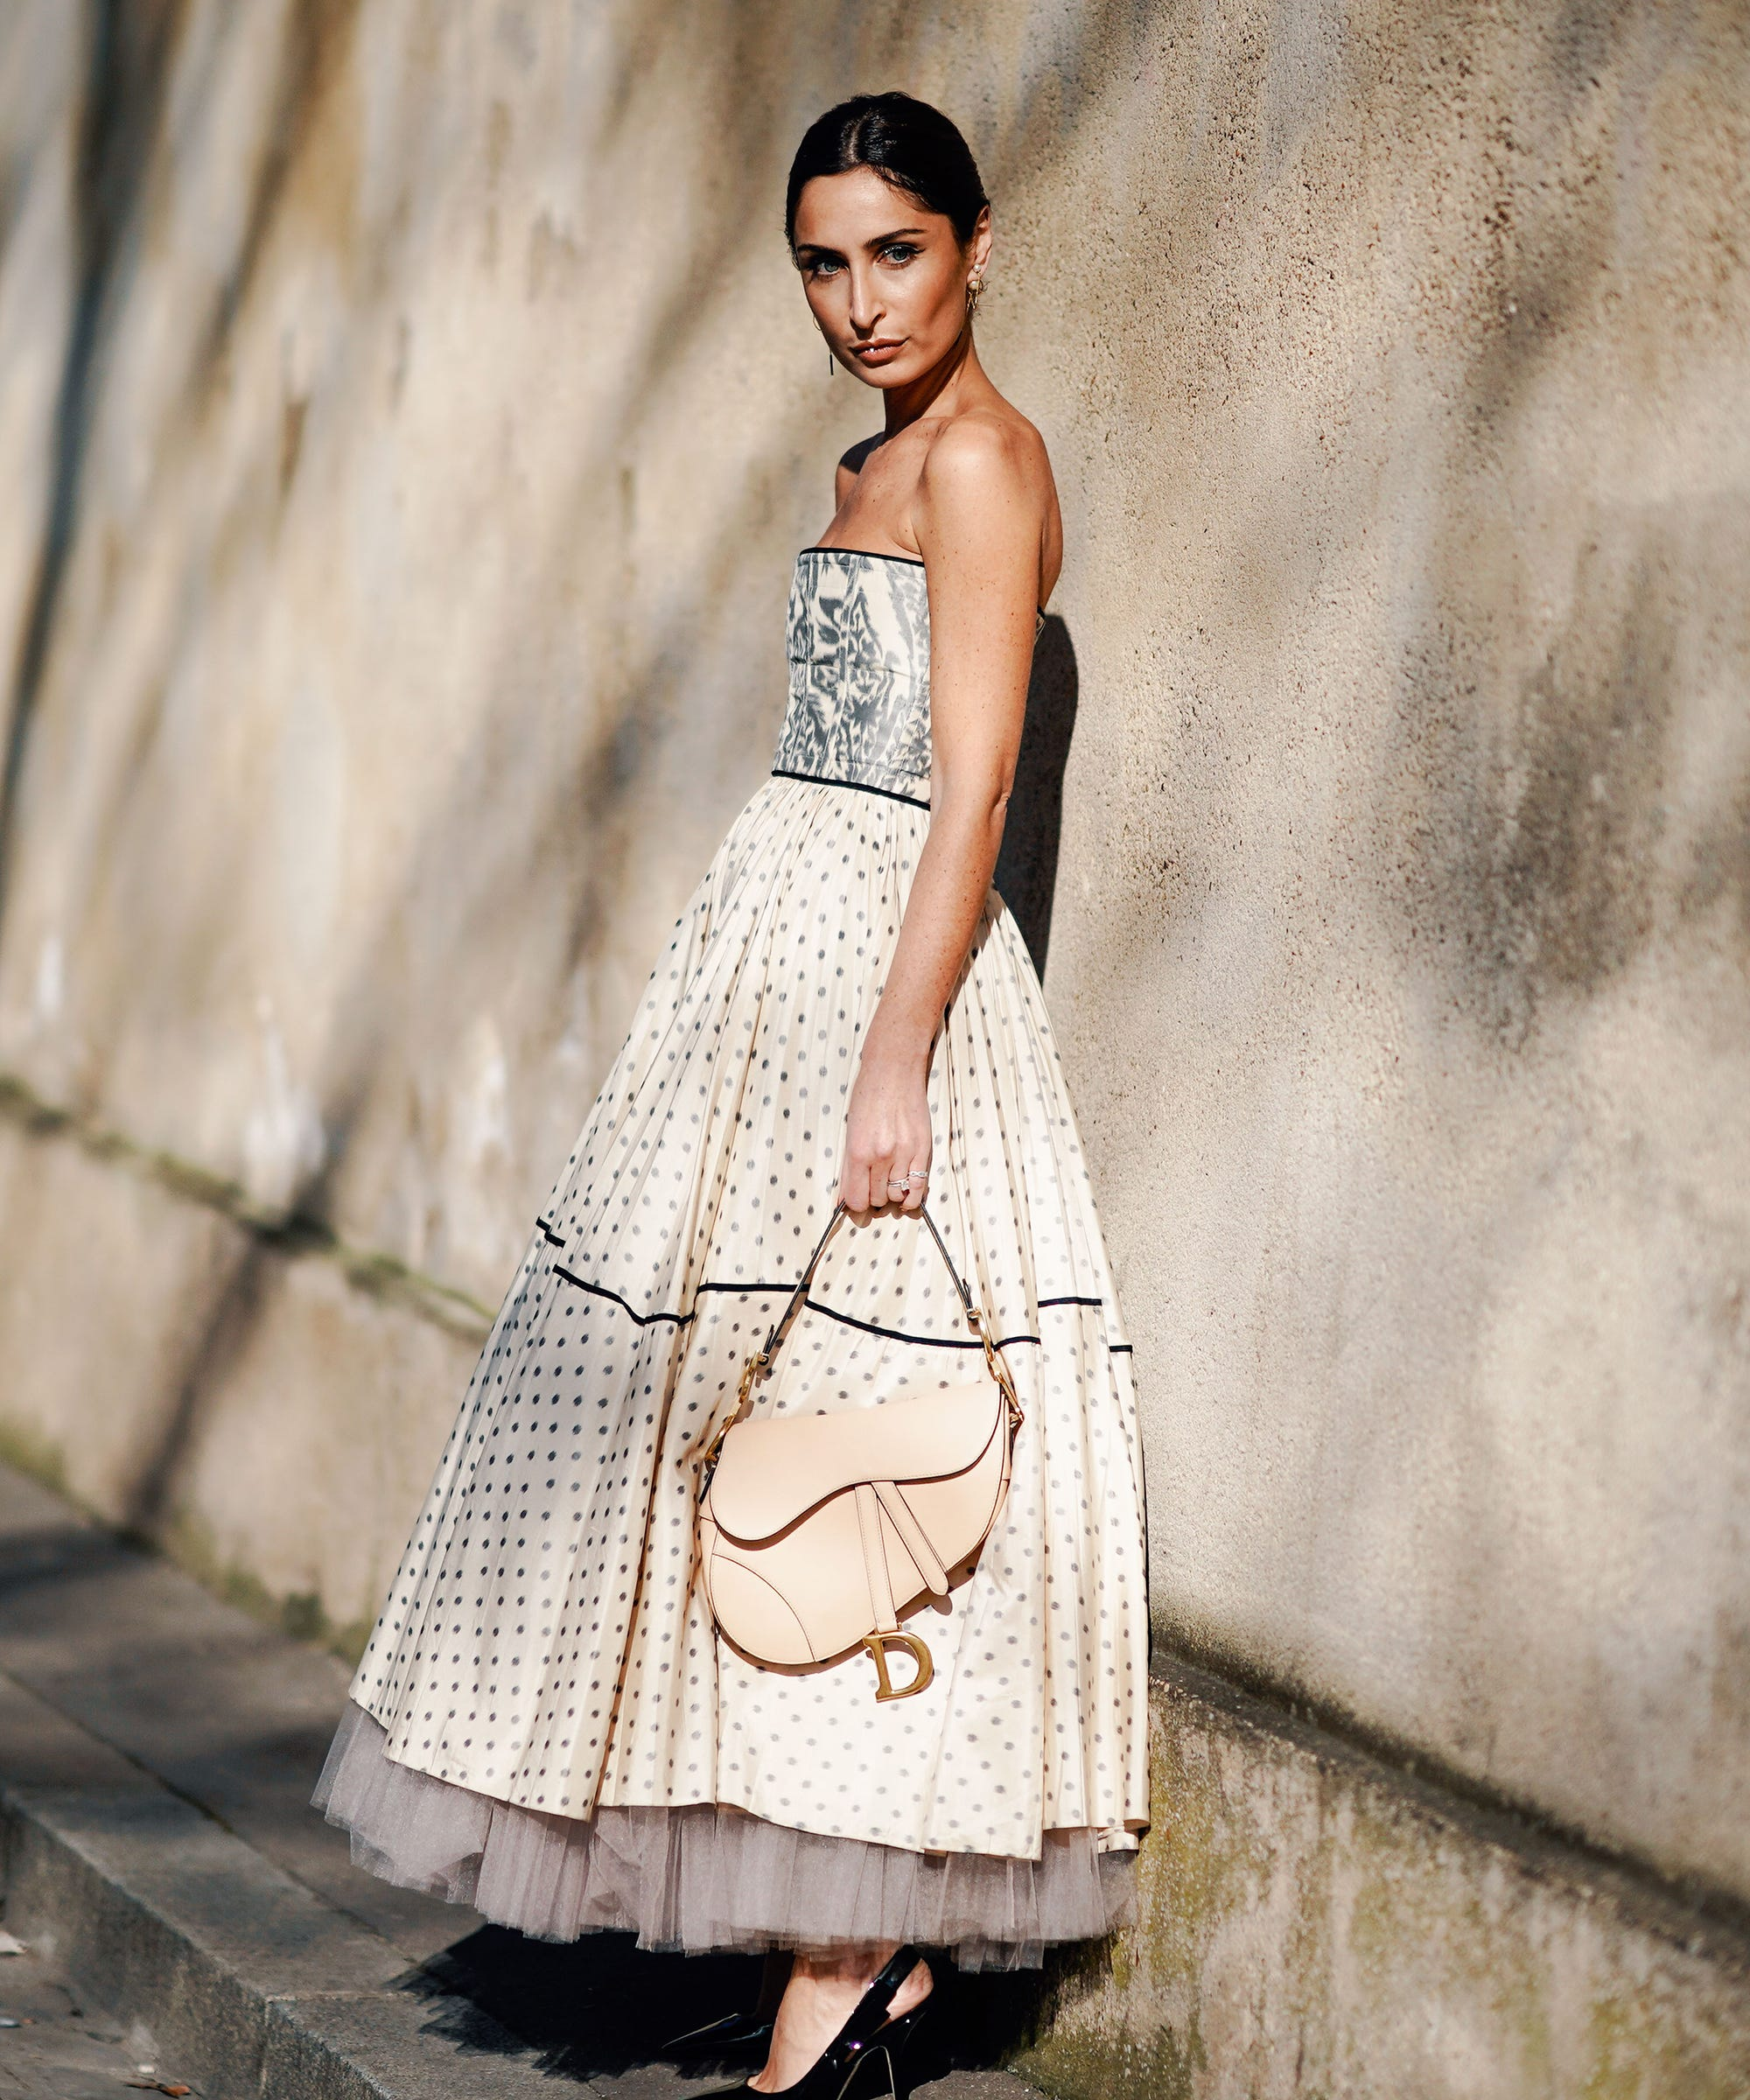 3b6c881a32c3 Flipboard: Kate Middleton Wears Gorgeous Two-Tone Gucci Dress to ...